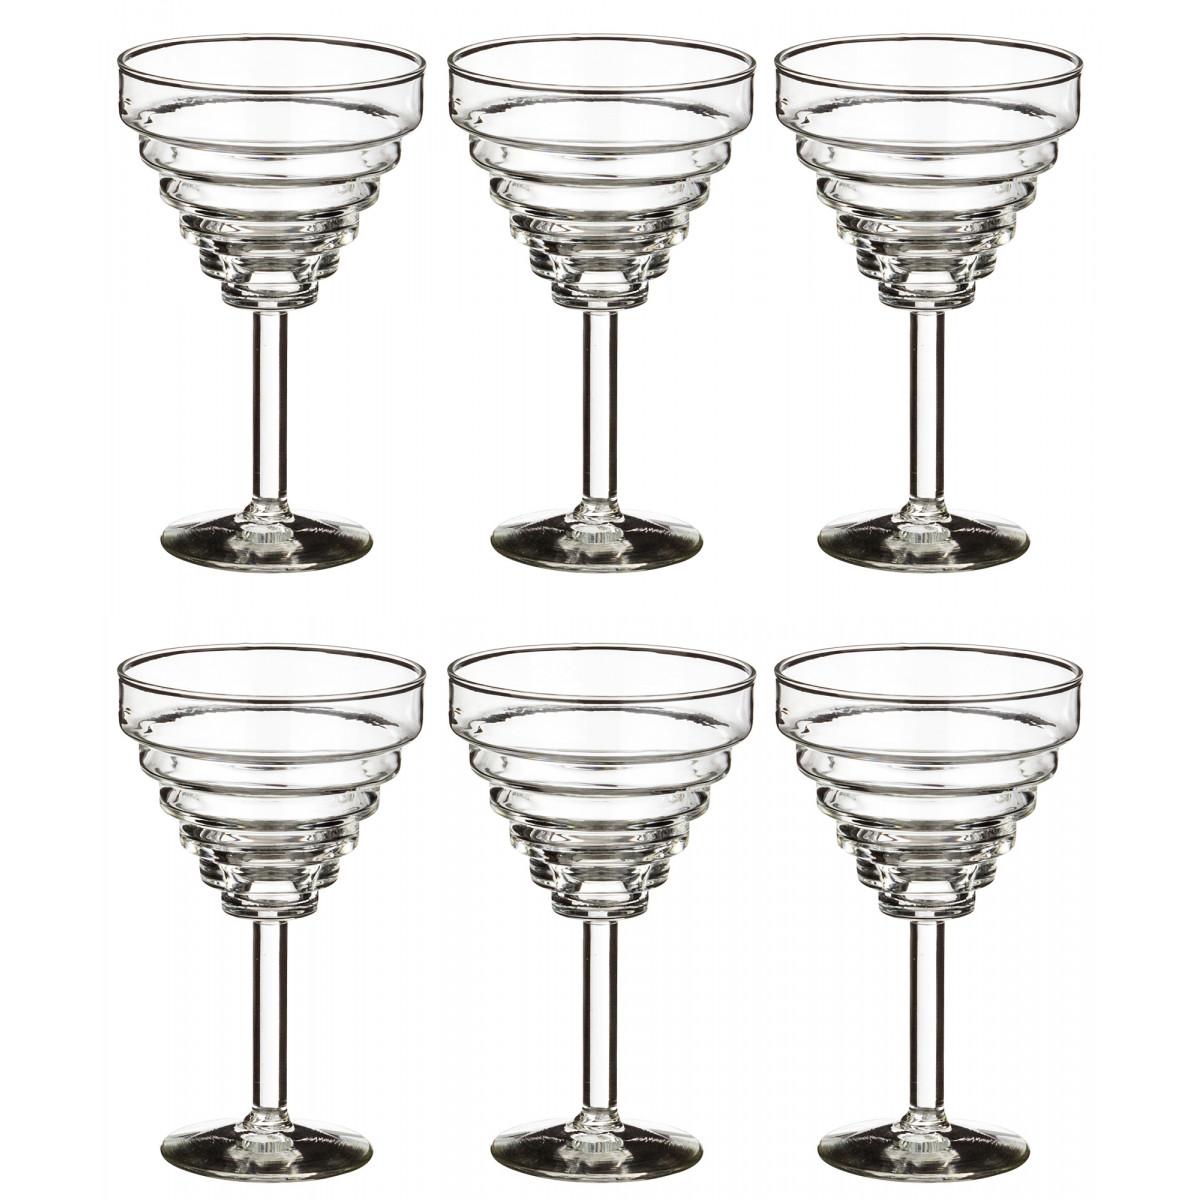 {} Durobor Набор бокалов для коктейлей Lawanda  (17 см - 6 шт) набор бокалов для бренди коралл 40600 q8105 400 анжела